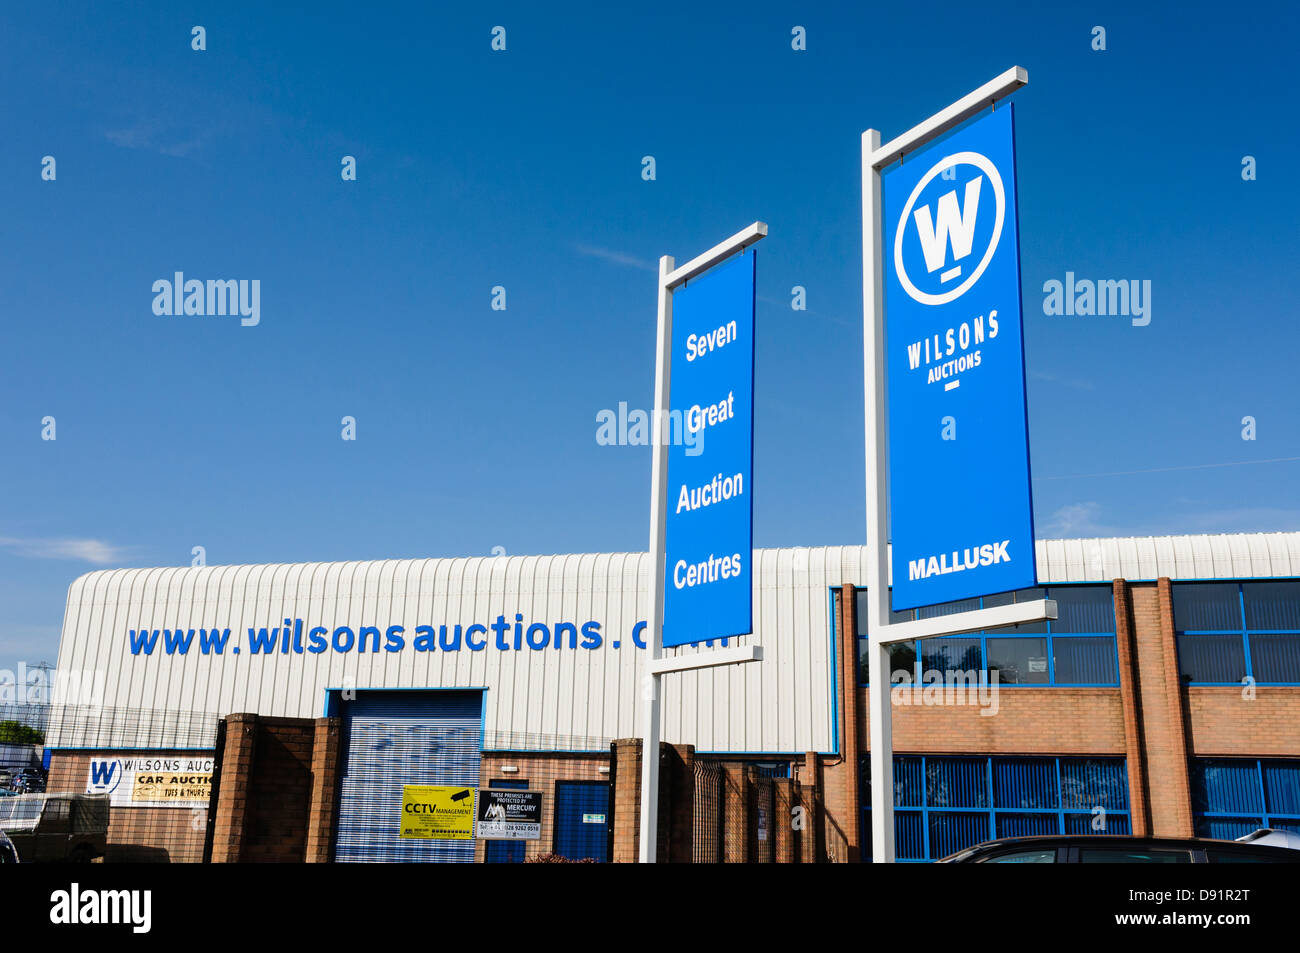 Wilson's Auction, Mallusk - Stock Image